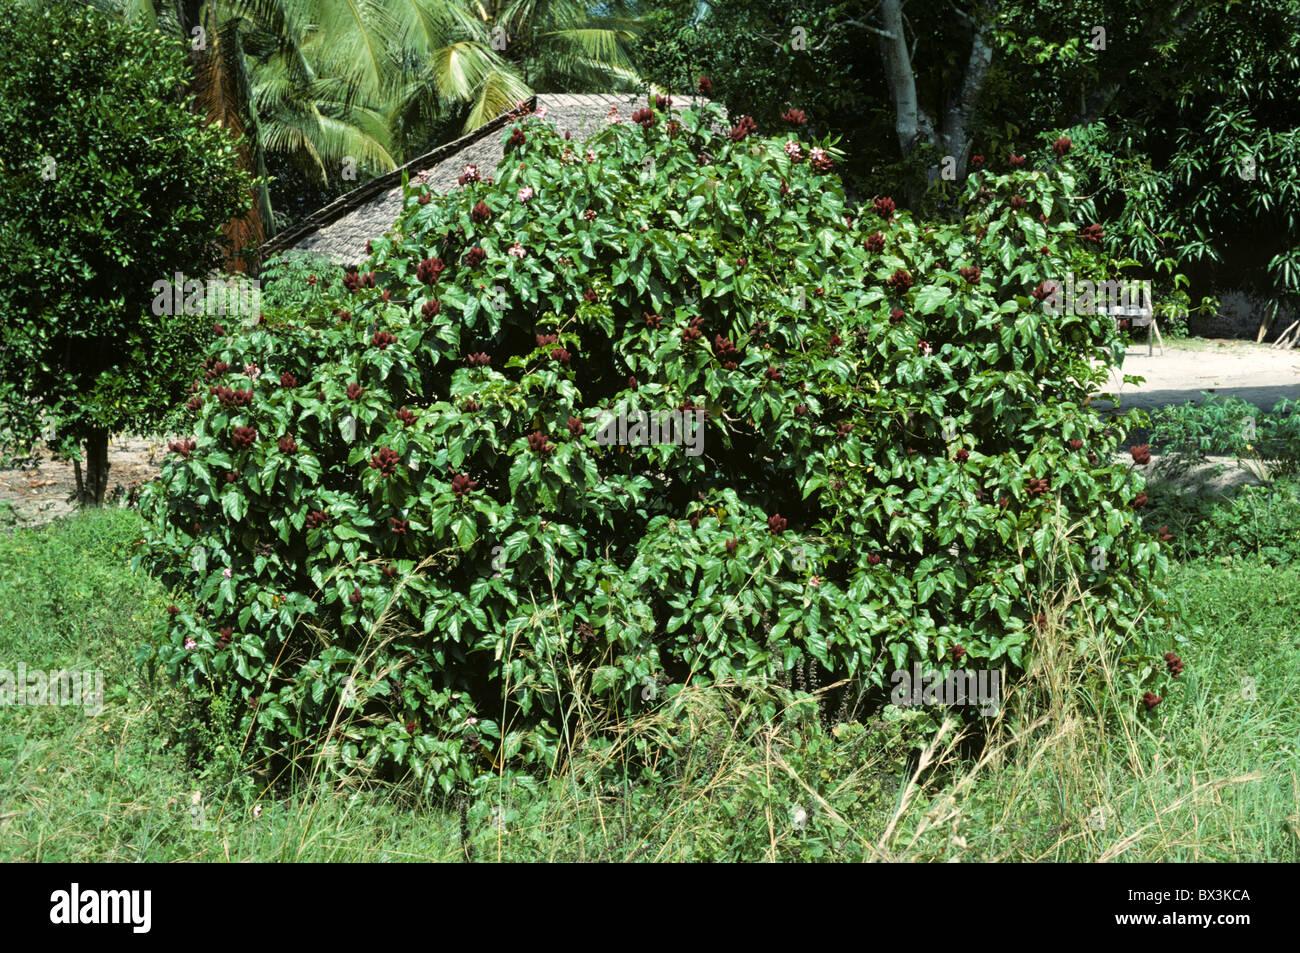 Bixa Farbstoff Pflanze mit reifen Samenkapseln, Kenia Stockbild